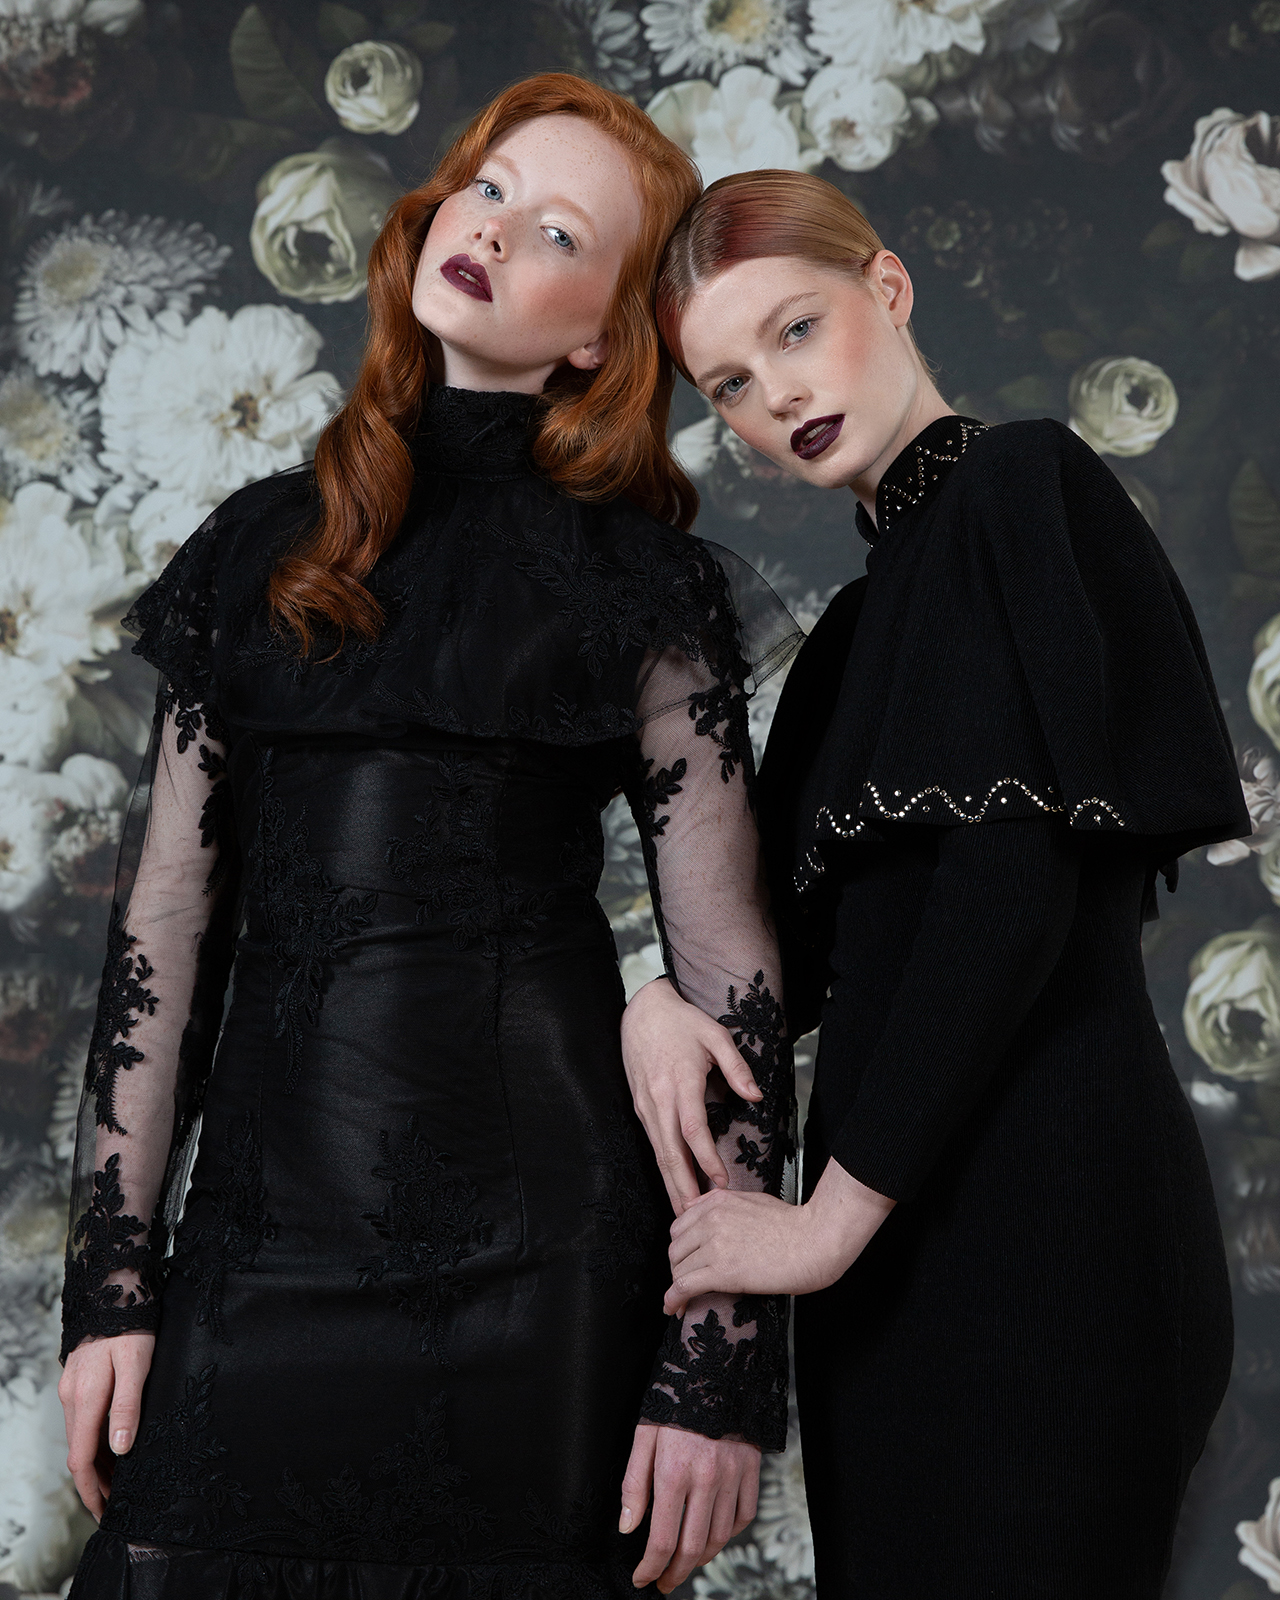 mark_and_naomi_toronto_fashion_photography_david_dunkley_black_tie_v.jpg